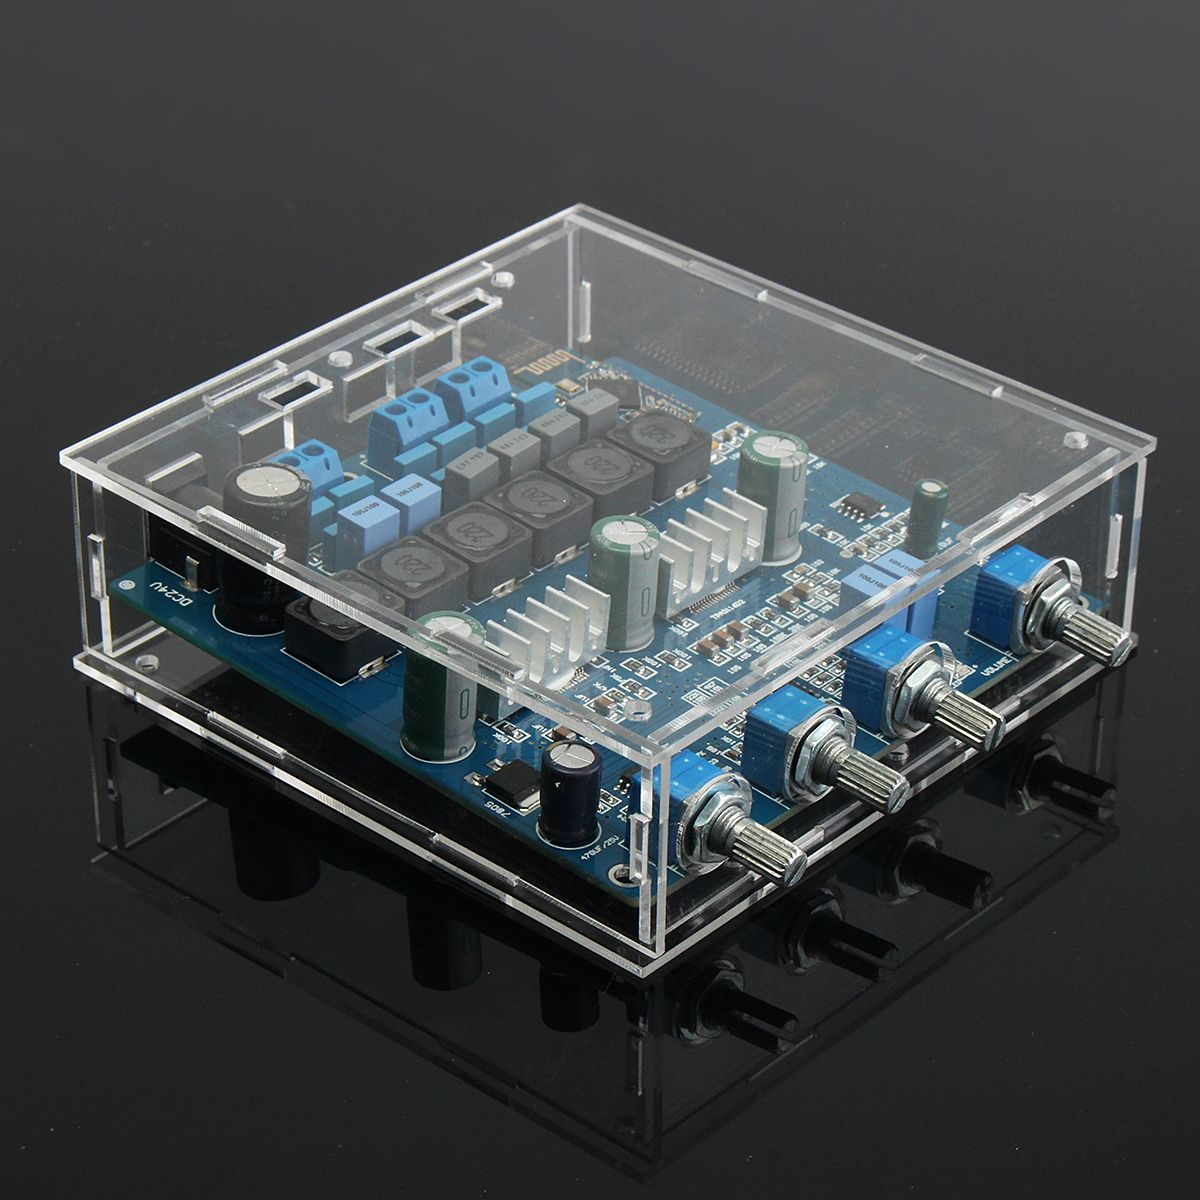 Circuito Bluetooth Casero : Tpa3116 2.1 50wx2 усилитель 100w bluetooth csr4.0 класса d